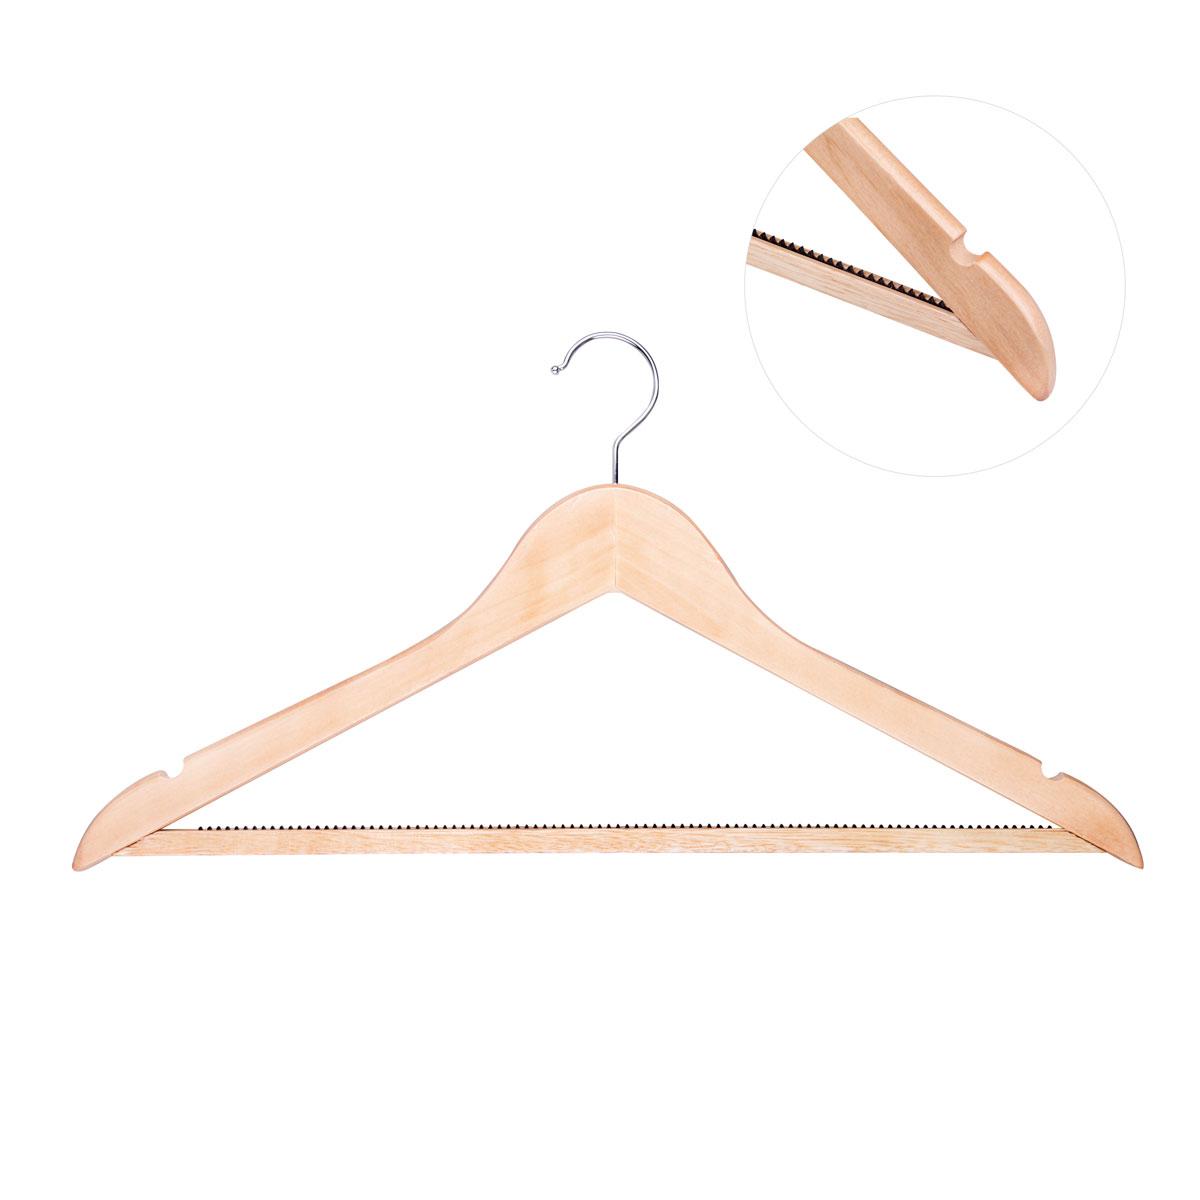 Вешалка для одежды Miolla, изогнутая, 44,5 х 23 х 1,2 см